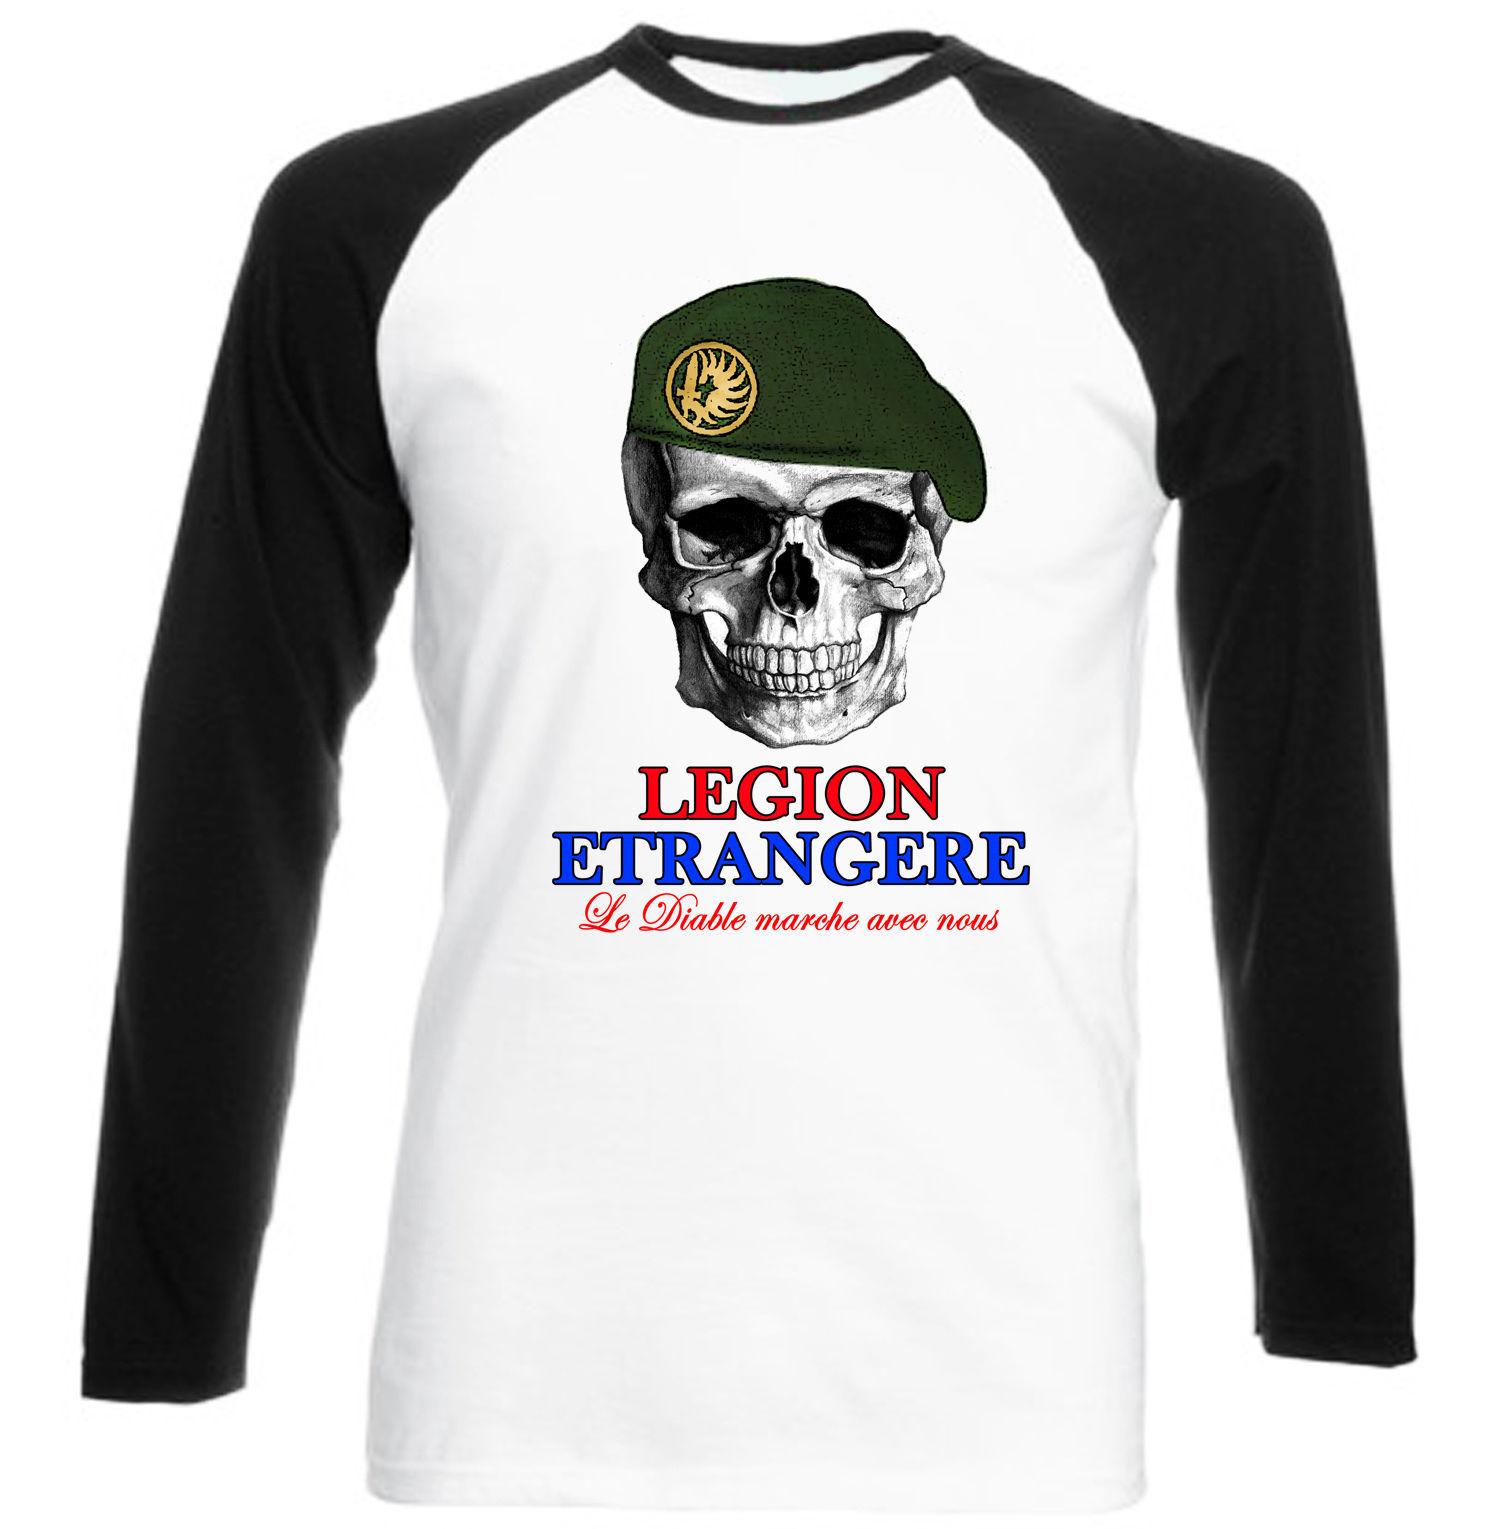 FRENCH LEGION ETRANGERE - NEW COTTON BLACK SLEEVED BASEBALL TSHIRT - $27.61